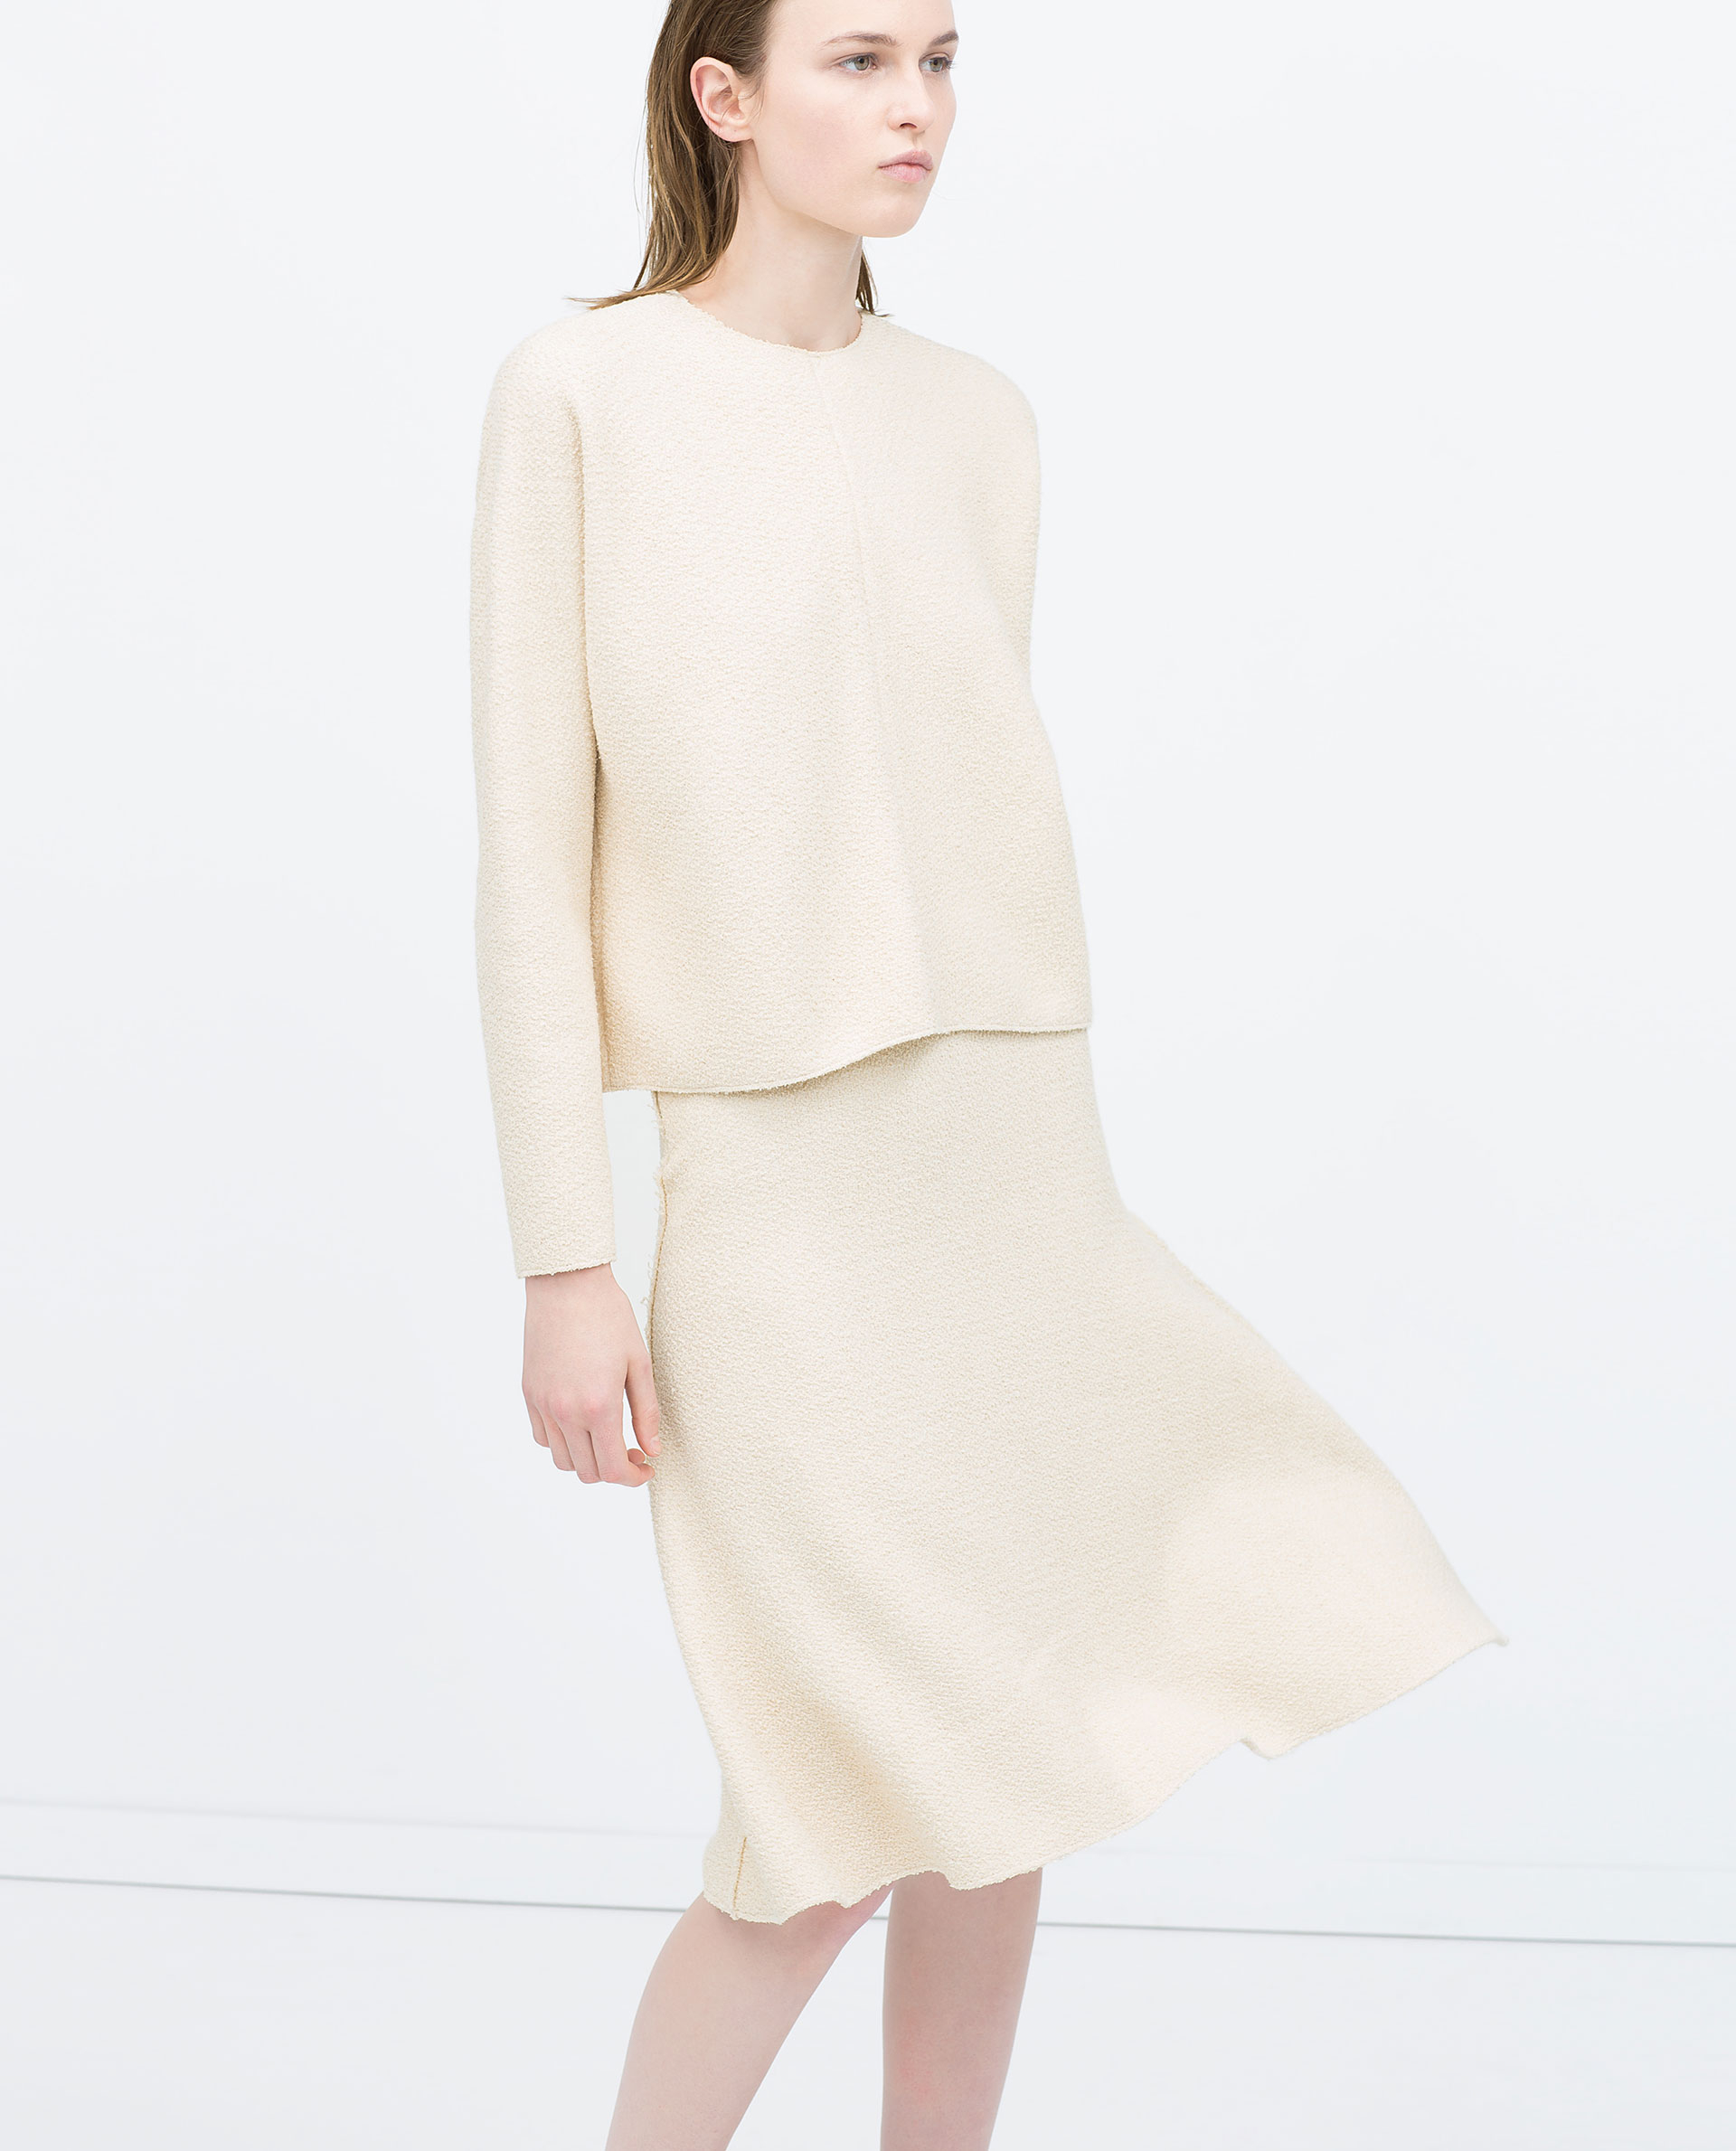 White Knit Skirt - Dress Ala